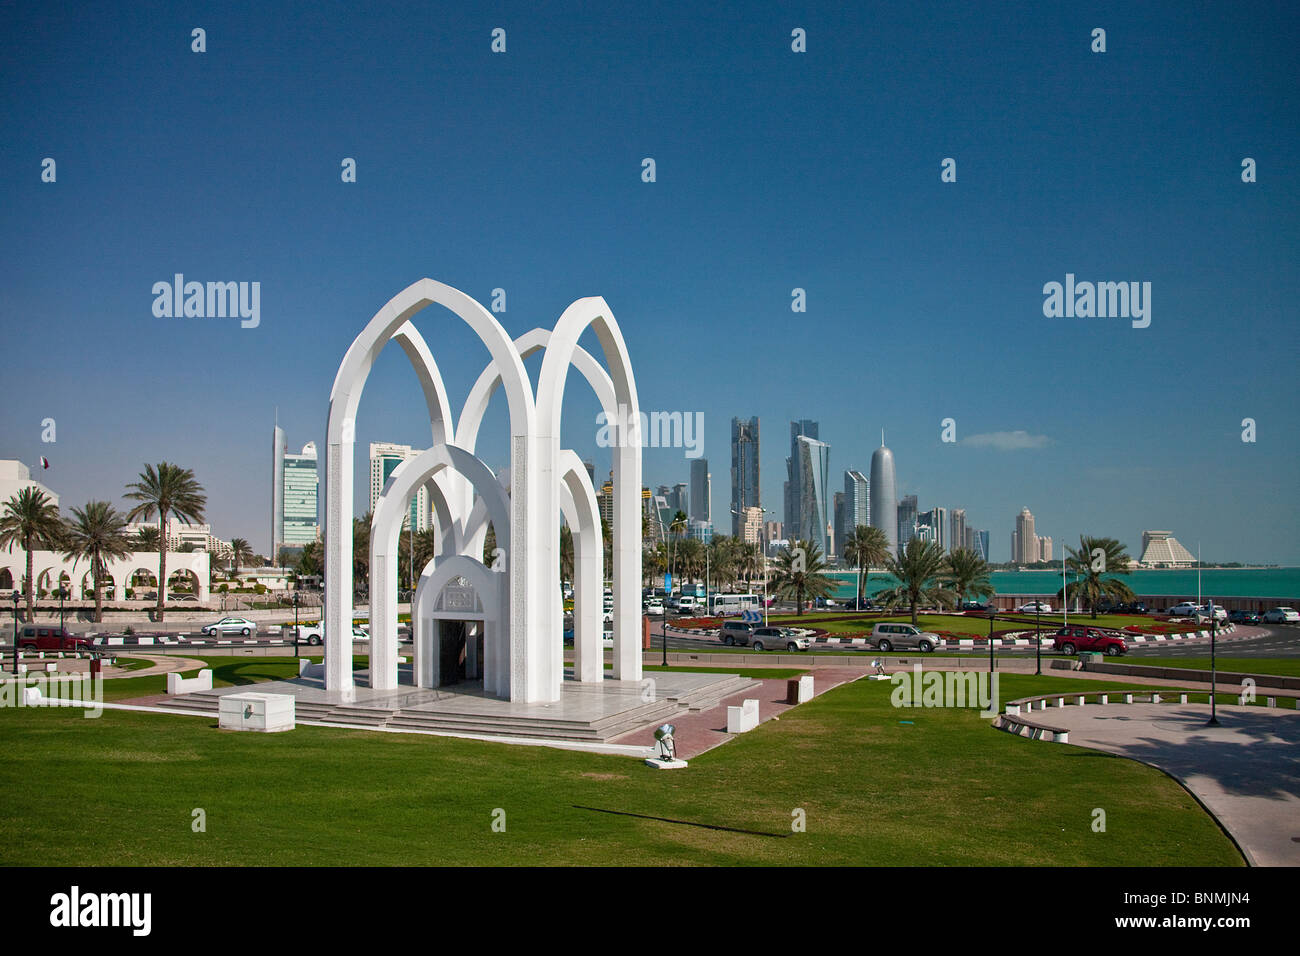 Qatar UAE United Arab Emirates Doha Bidda curves plastic art skill traveling place of interest landmark - Stock Image